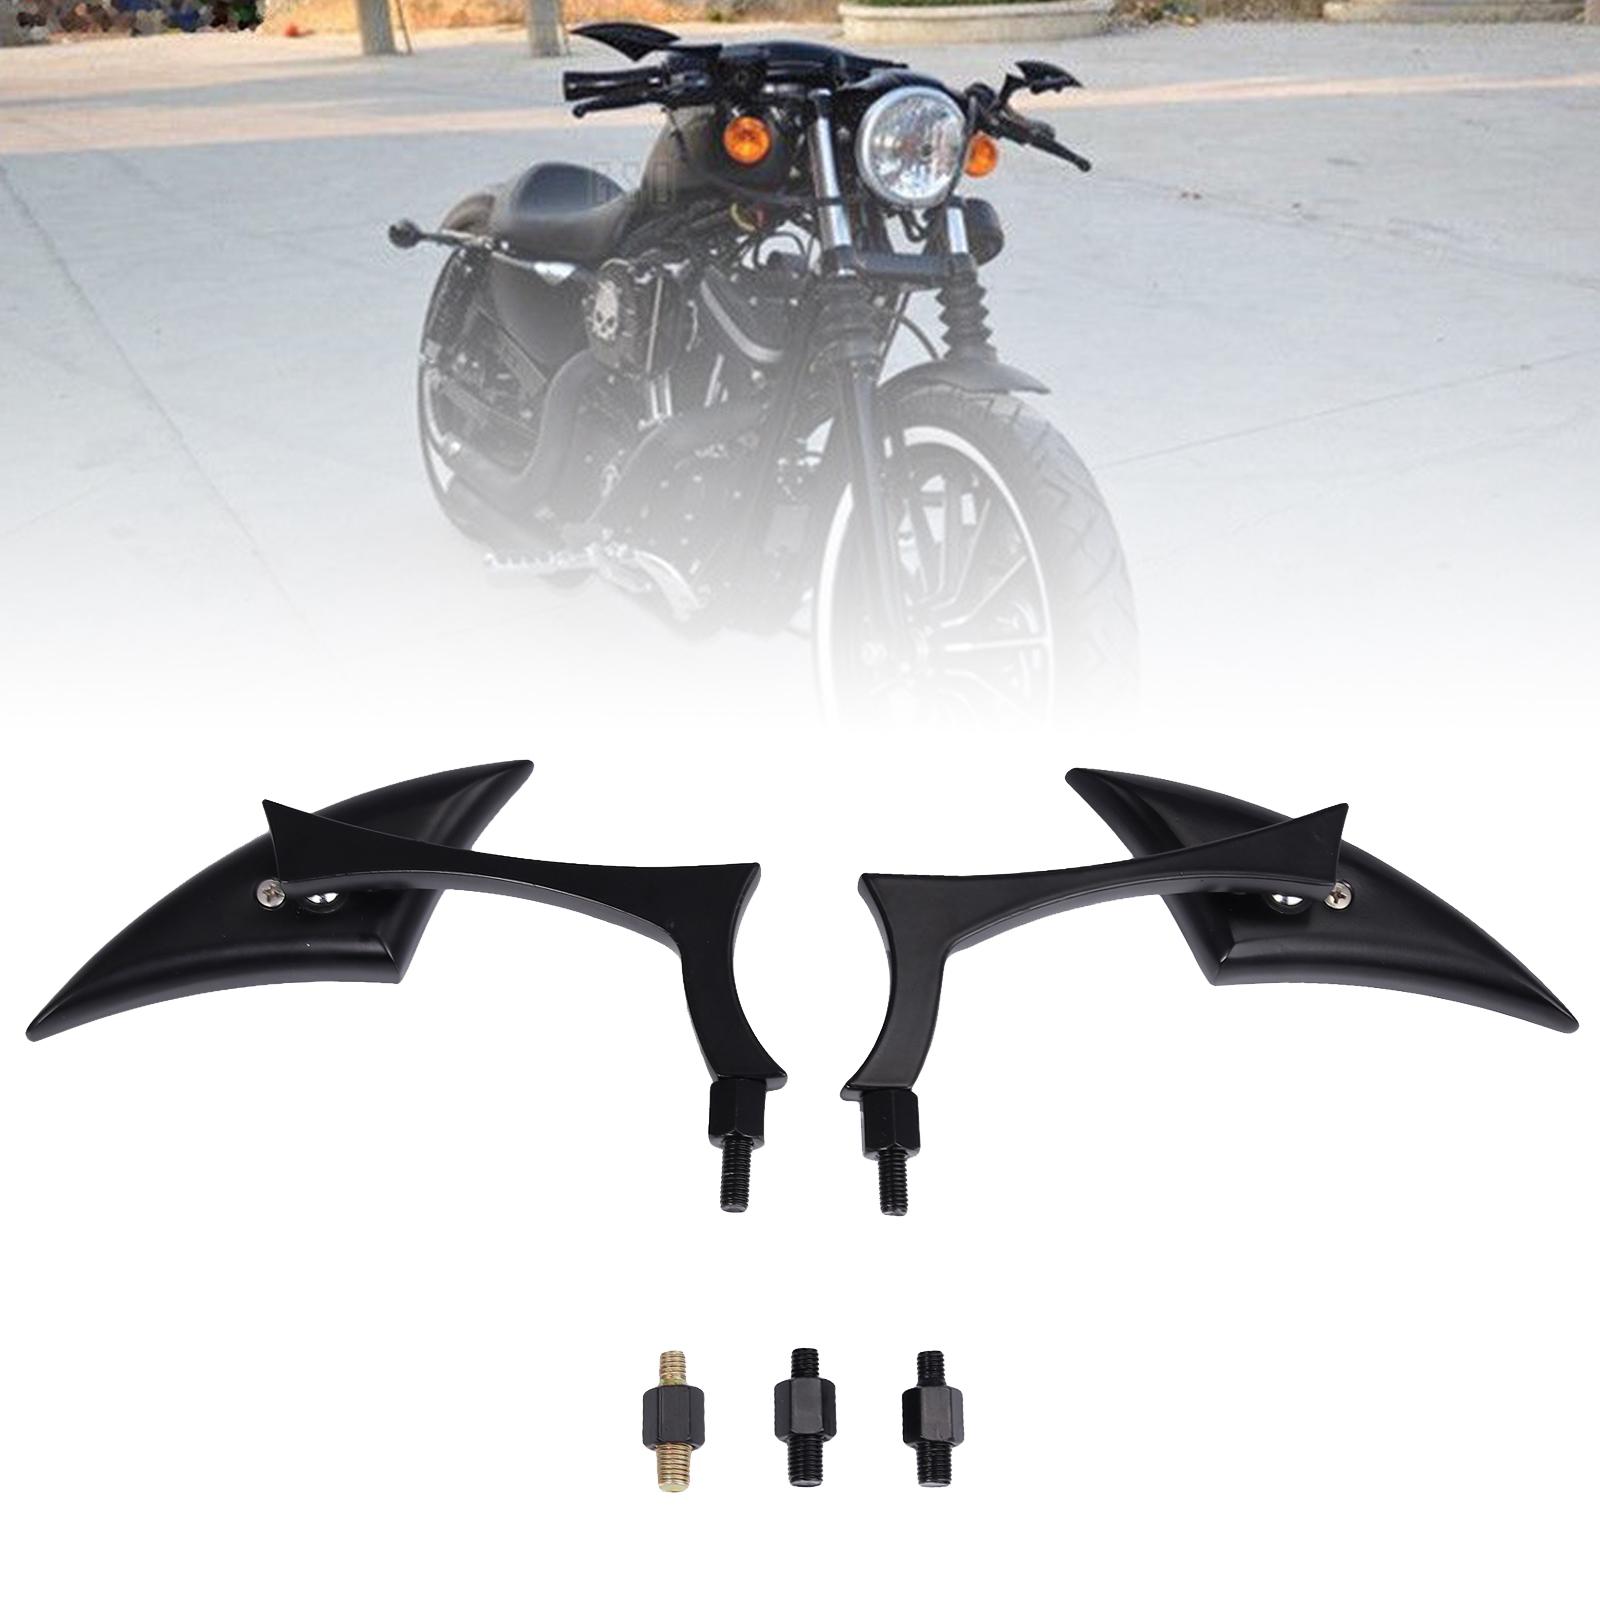 BLACK BLADE STEADY CNC ALUMINUM MIRRORS FOR MOTORCYCLE CRUISER CHOPPER 8-10MM